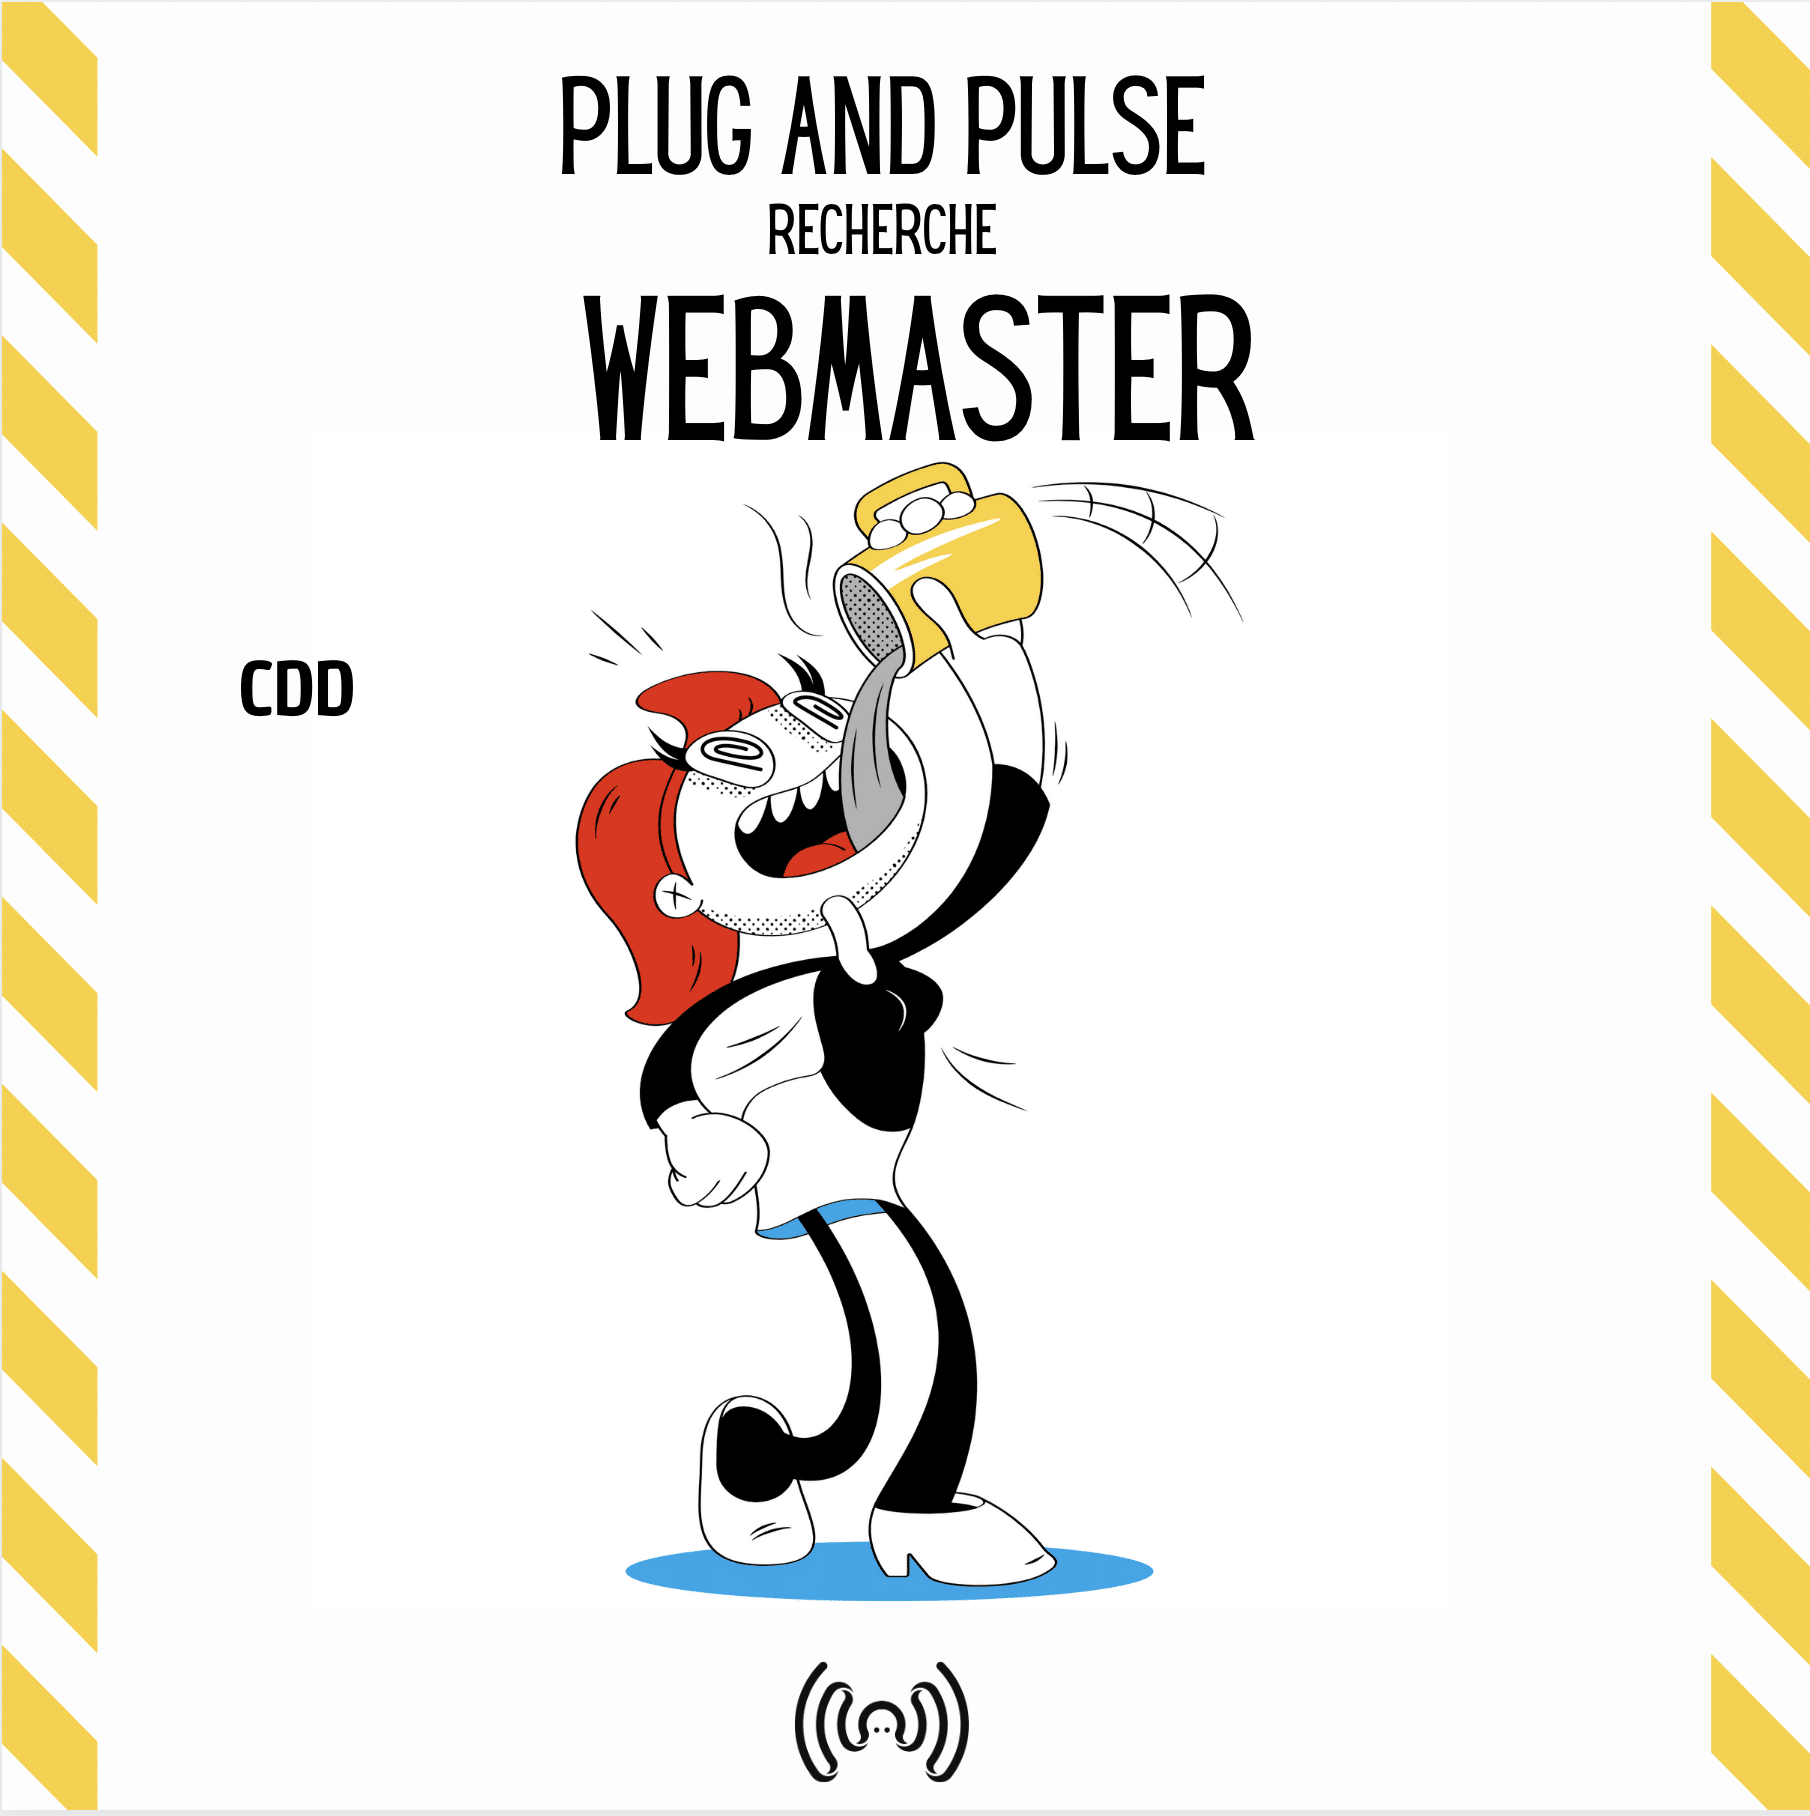 plug and pulse recherche webmaster CDD offre d'emploi